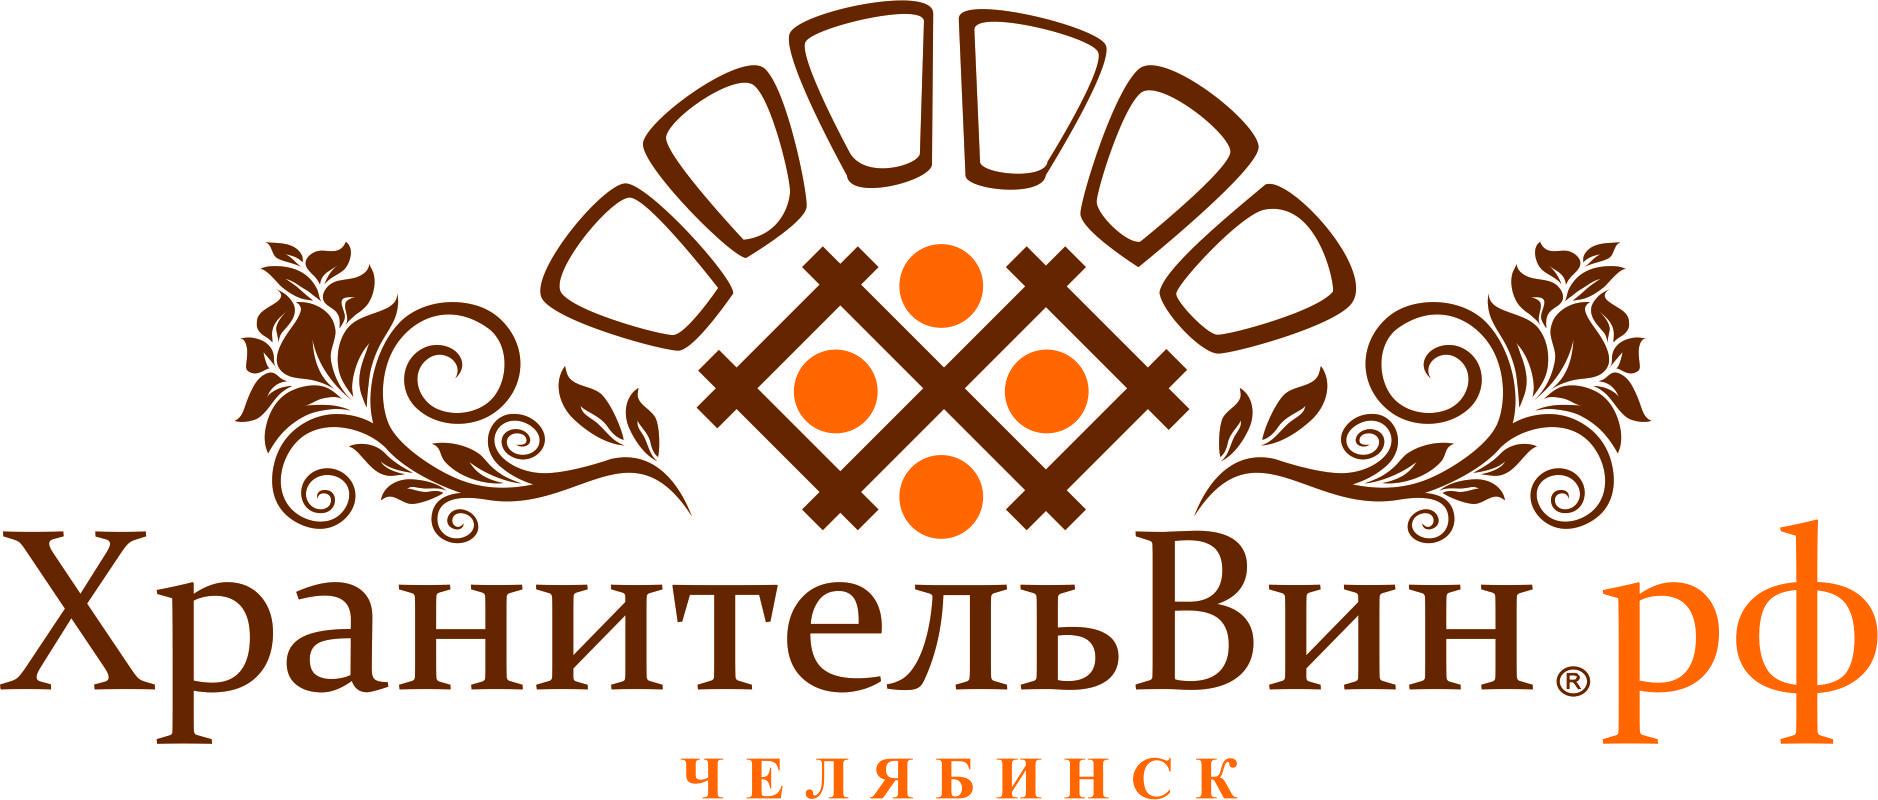 ... интернет-магазина в Челябинске: 74-rabota.ru/work/vacancy/works_41465.html